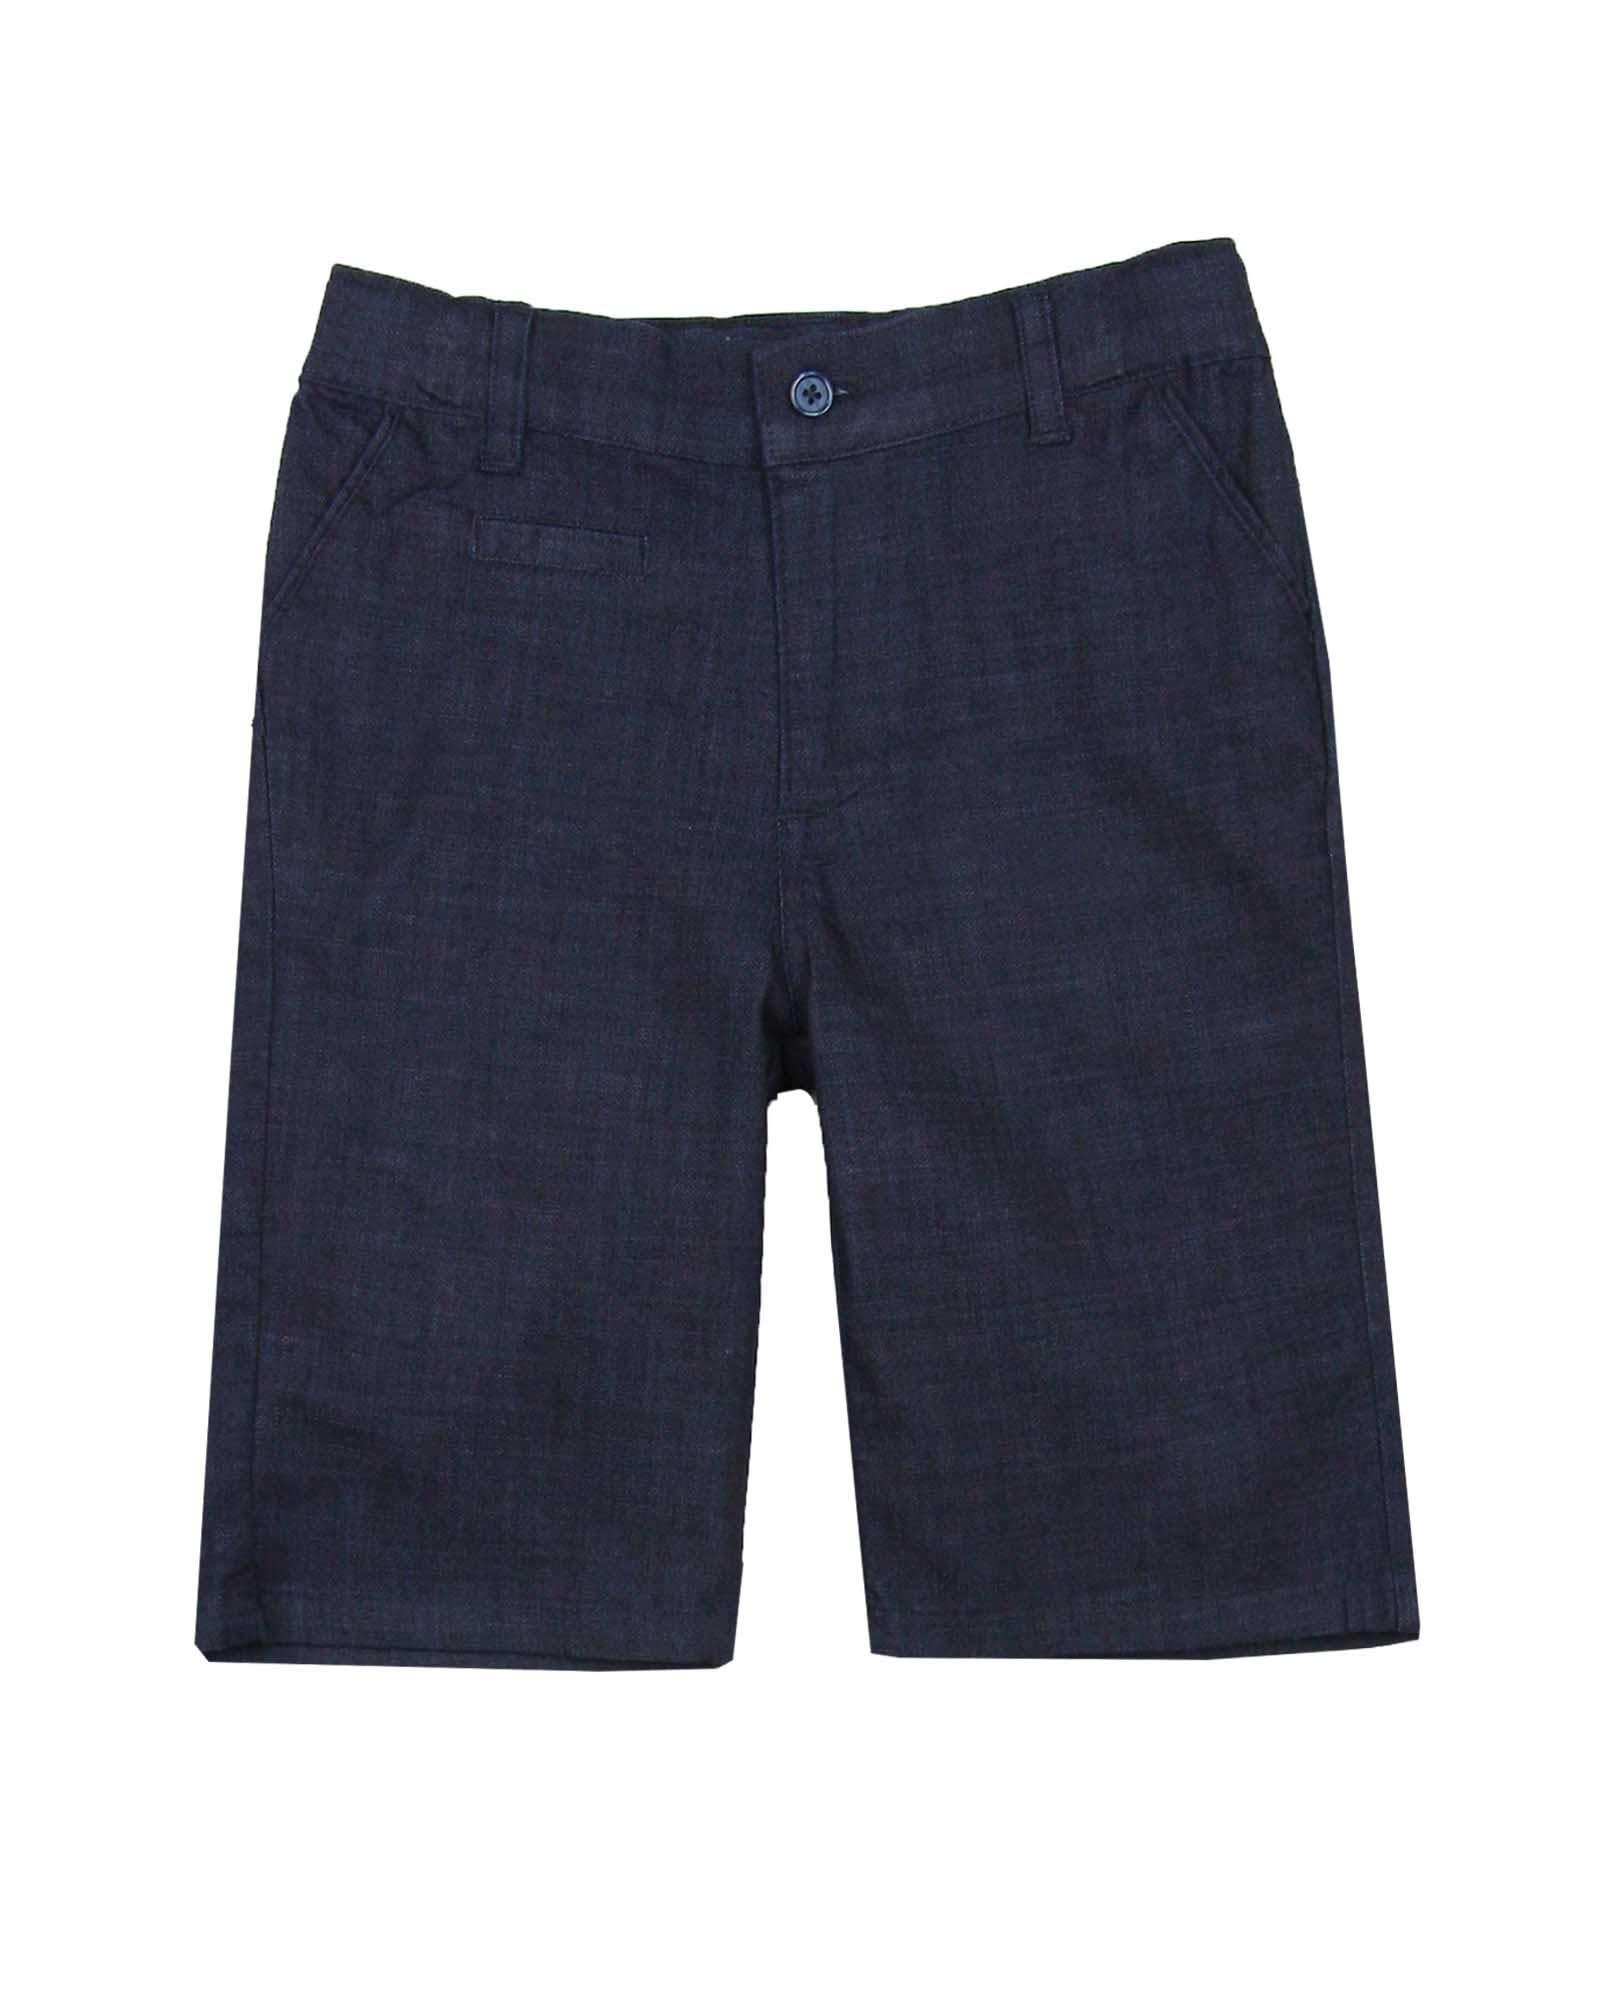 Deux par Deux Boys' Tailored Bermuda Shorts in Denim Look Casual Chic, Sizes 5-12 - 5